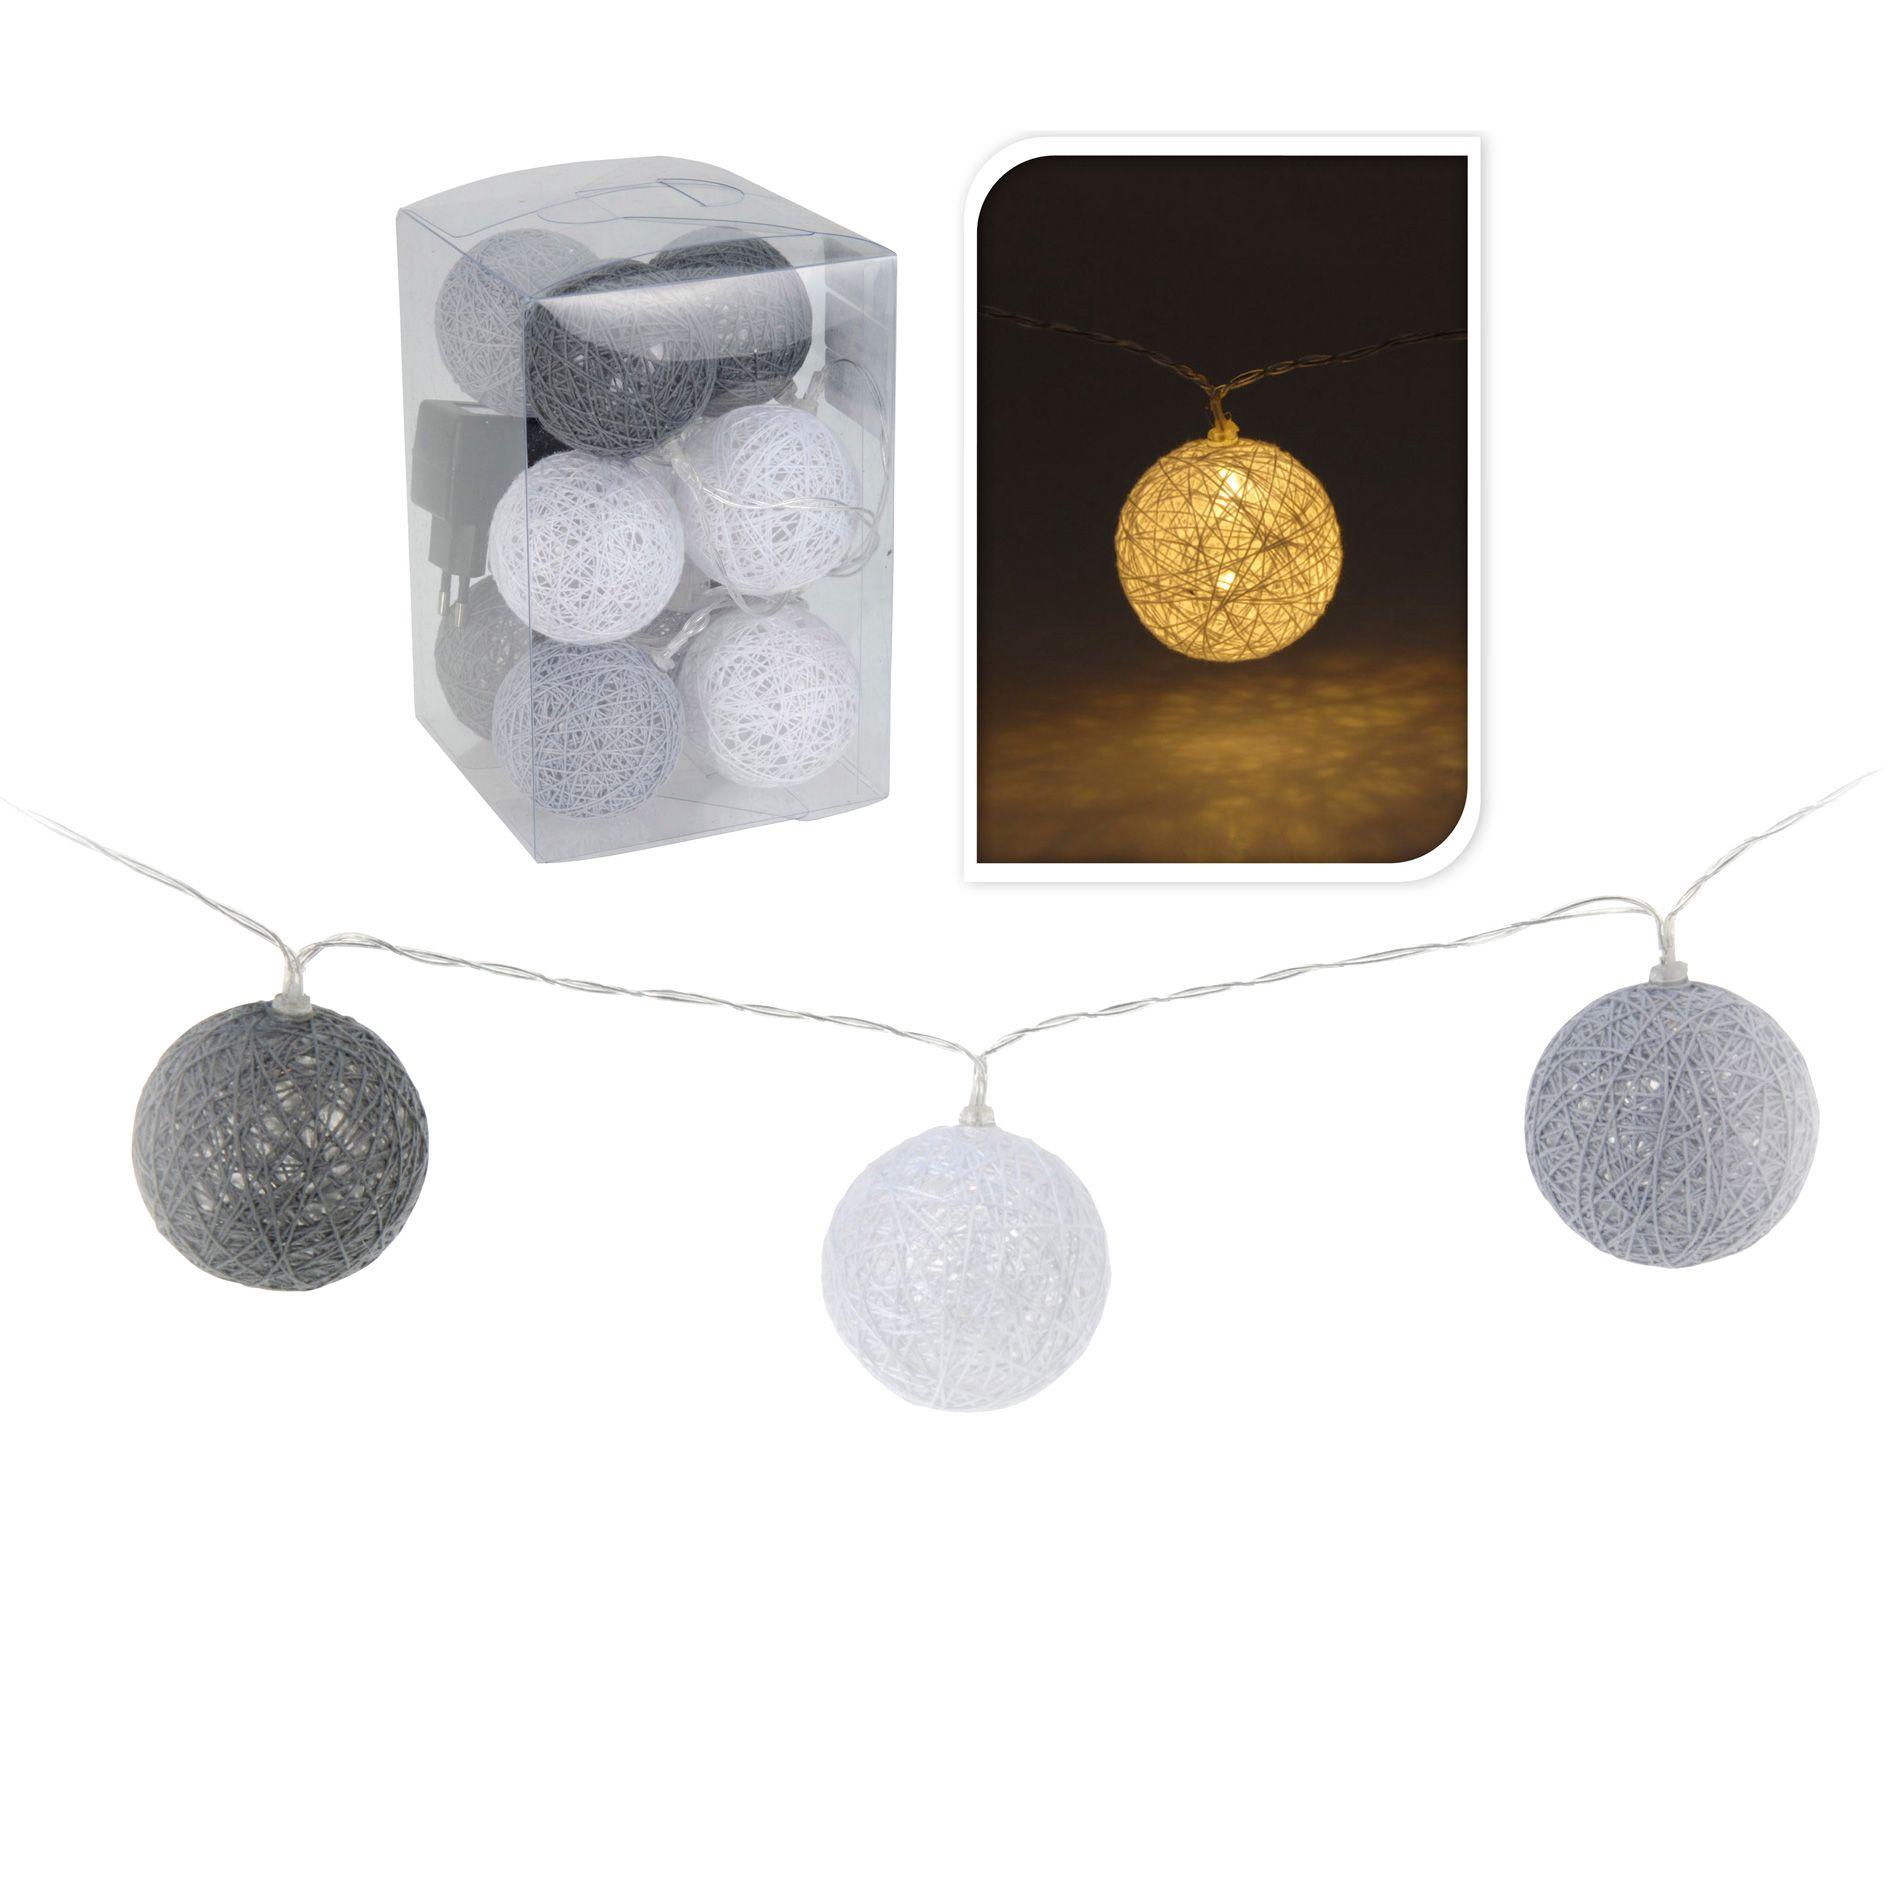 guirlande lumineuse boule raffia blanc chaud 10 led guirlande lumineuse eminza. Black Bedroom Furniture Sets. Home Design Ideas